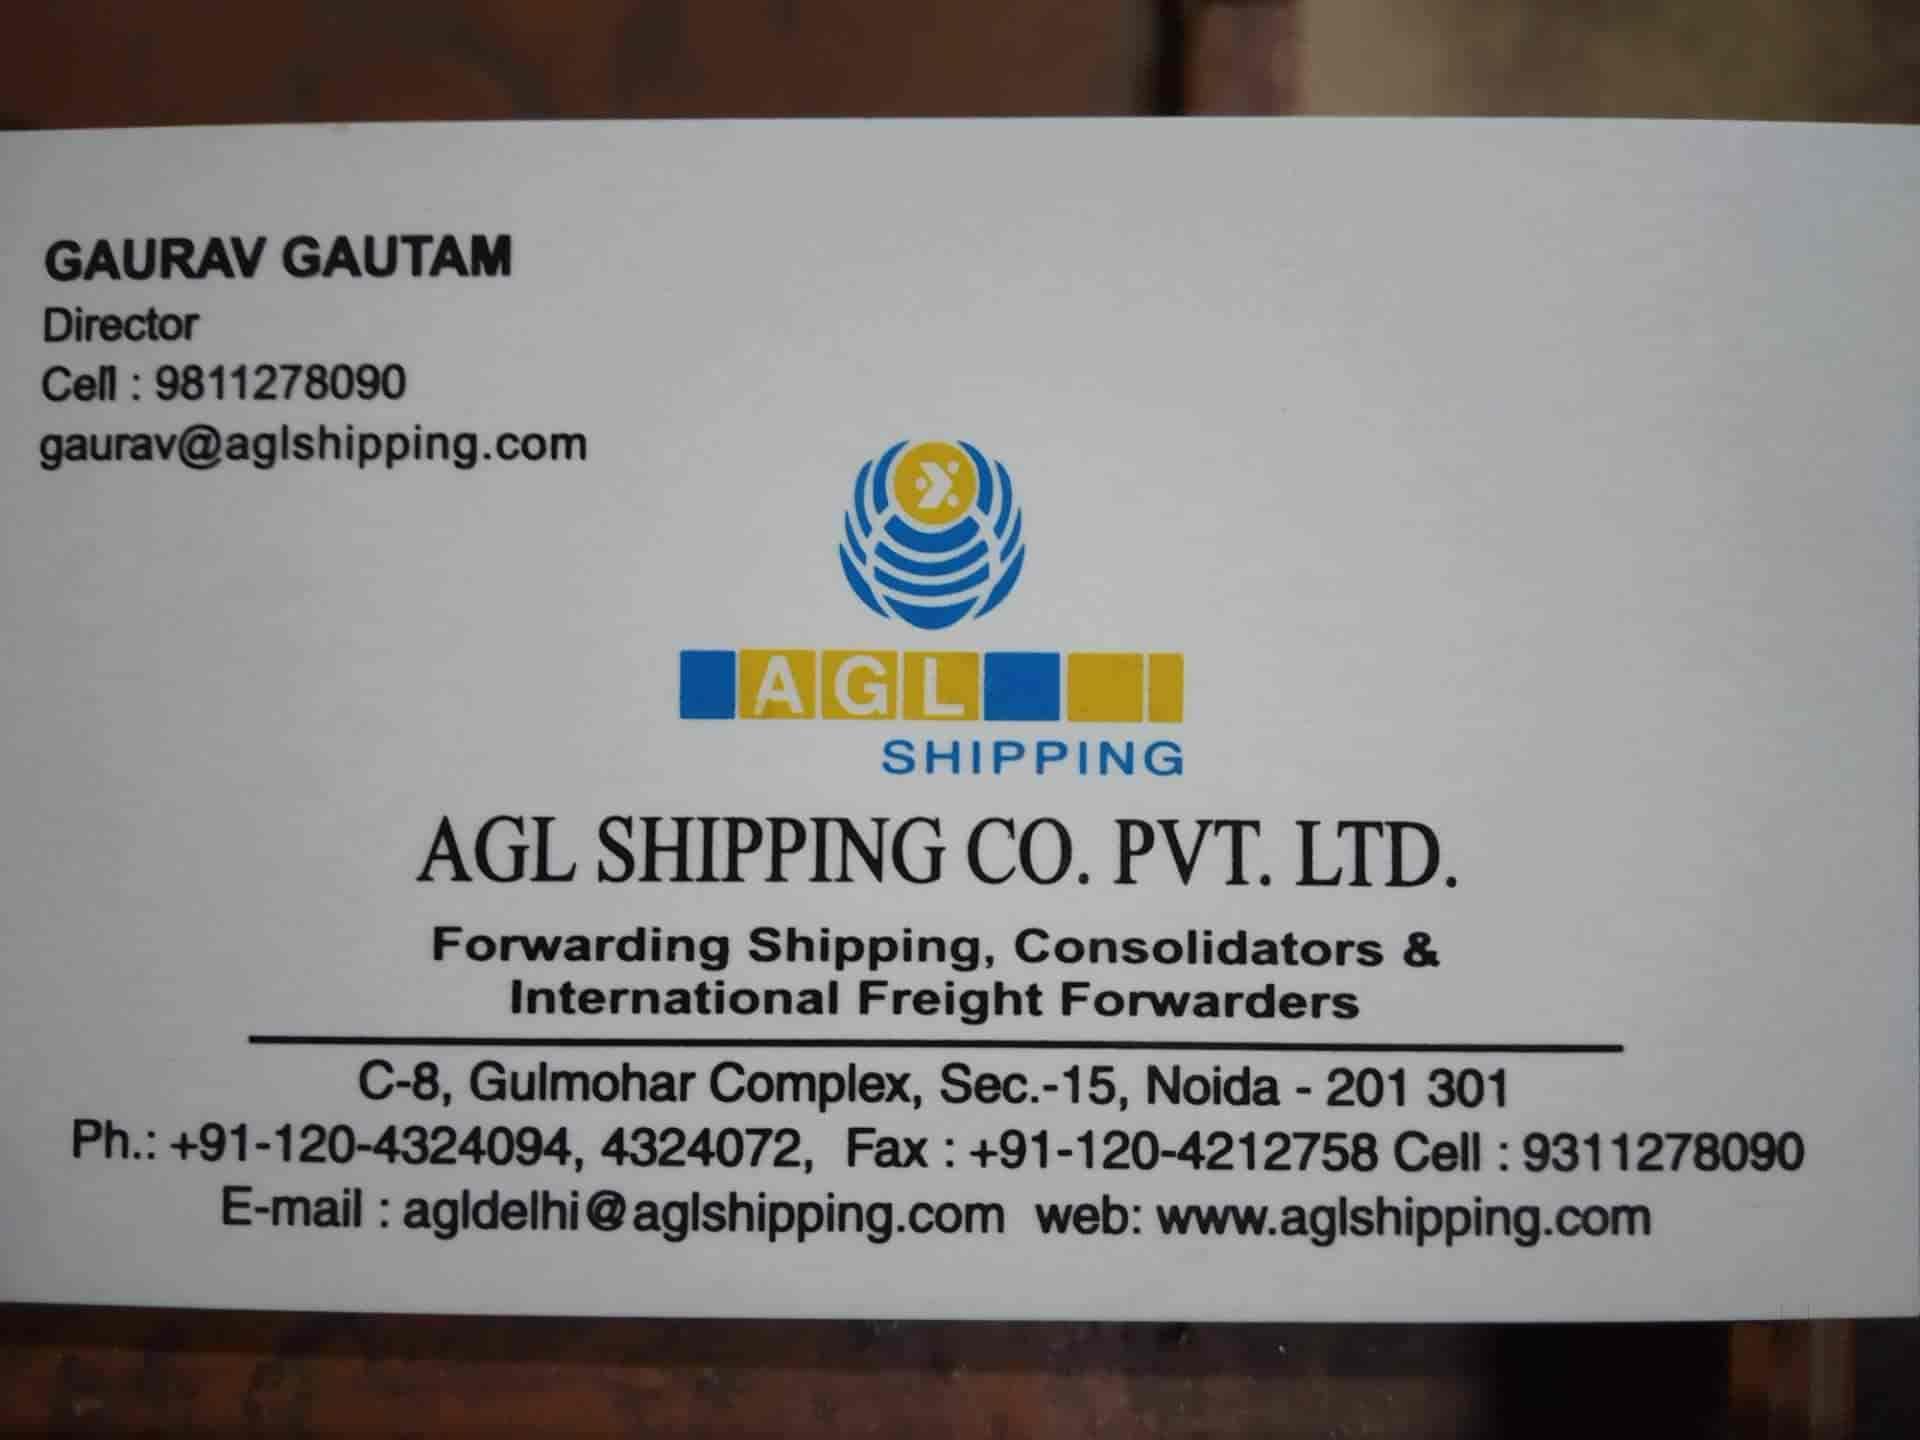 Agl Shipping Co Pvt Ltd Photos, Sector 15, Noida- Pictures